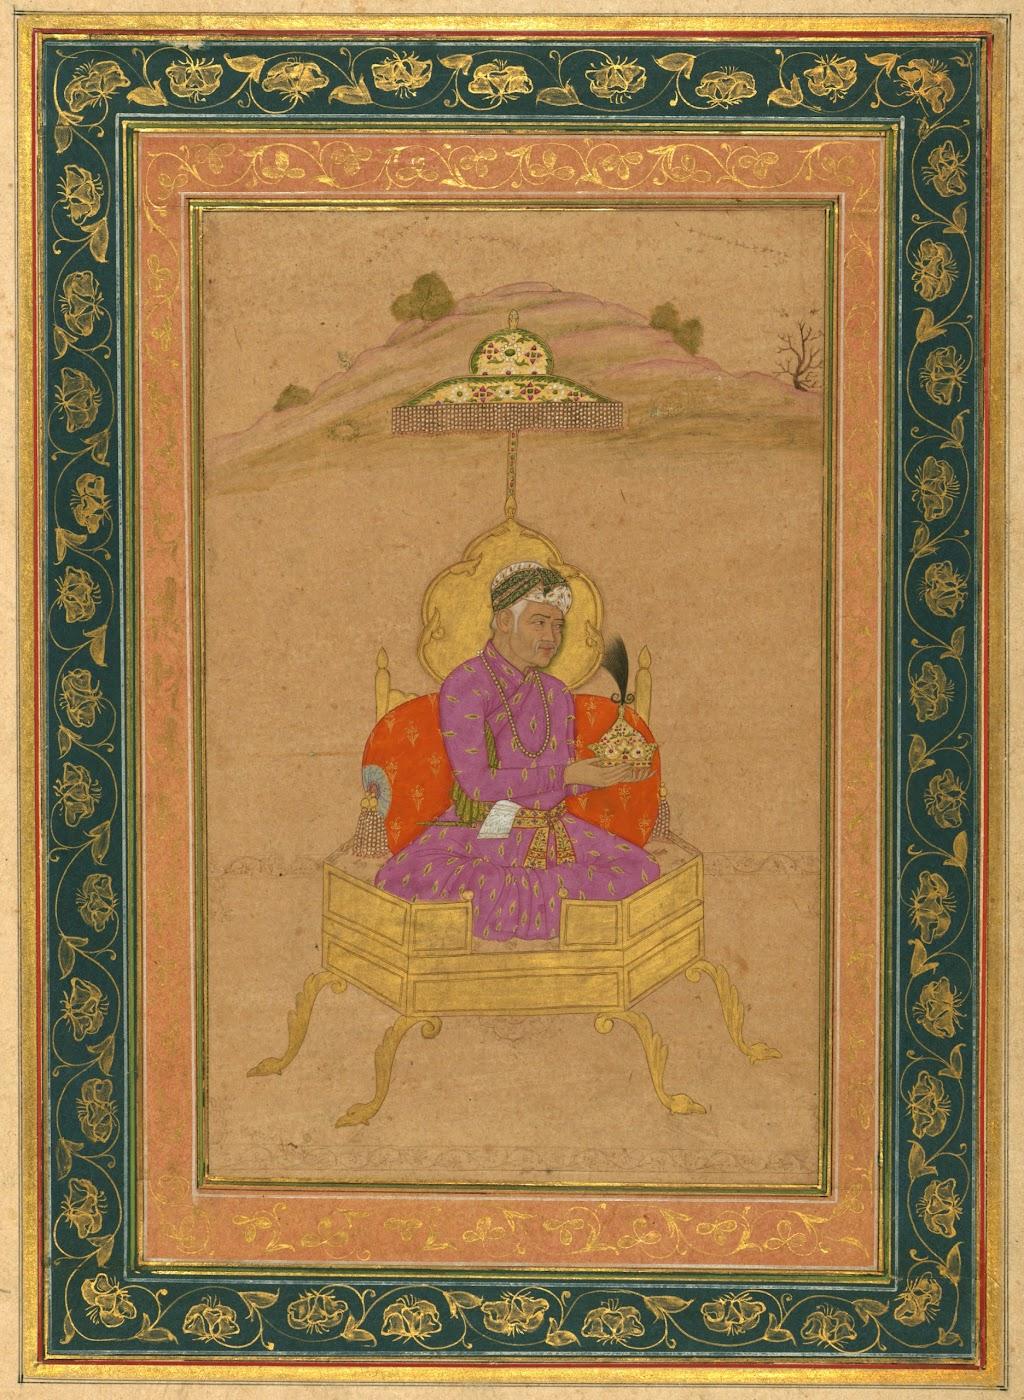 Portrait of Third Mughal Emperor Akbar - Mughal Painting, Circa 18th Century